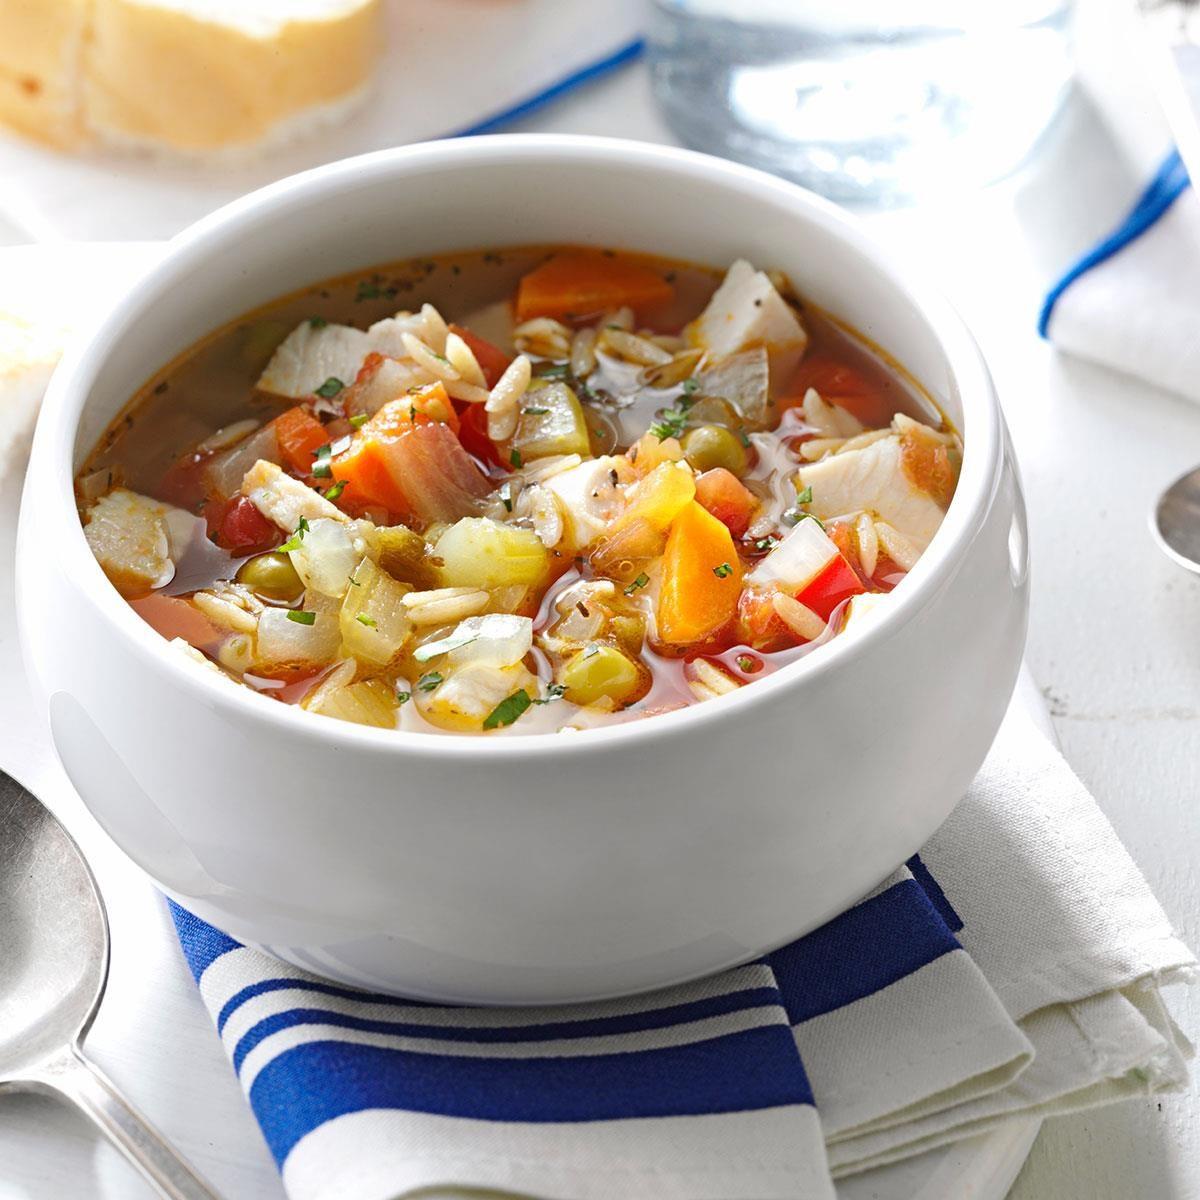 Skinny Turkey-Vegetable Soup Recipe